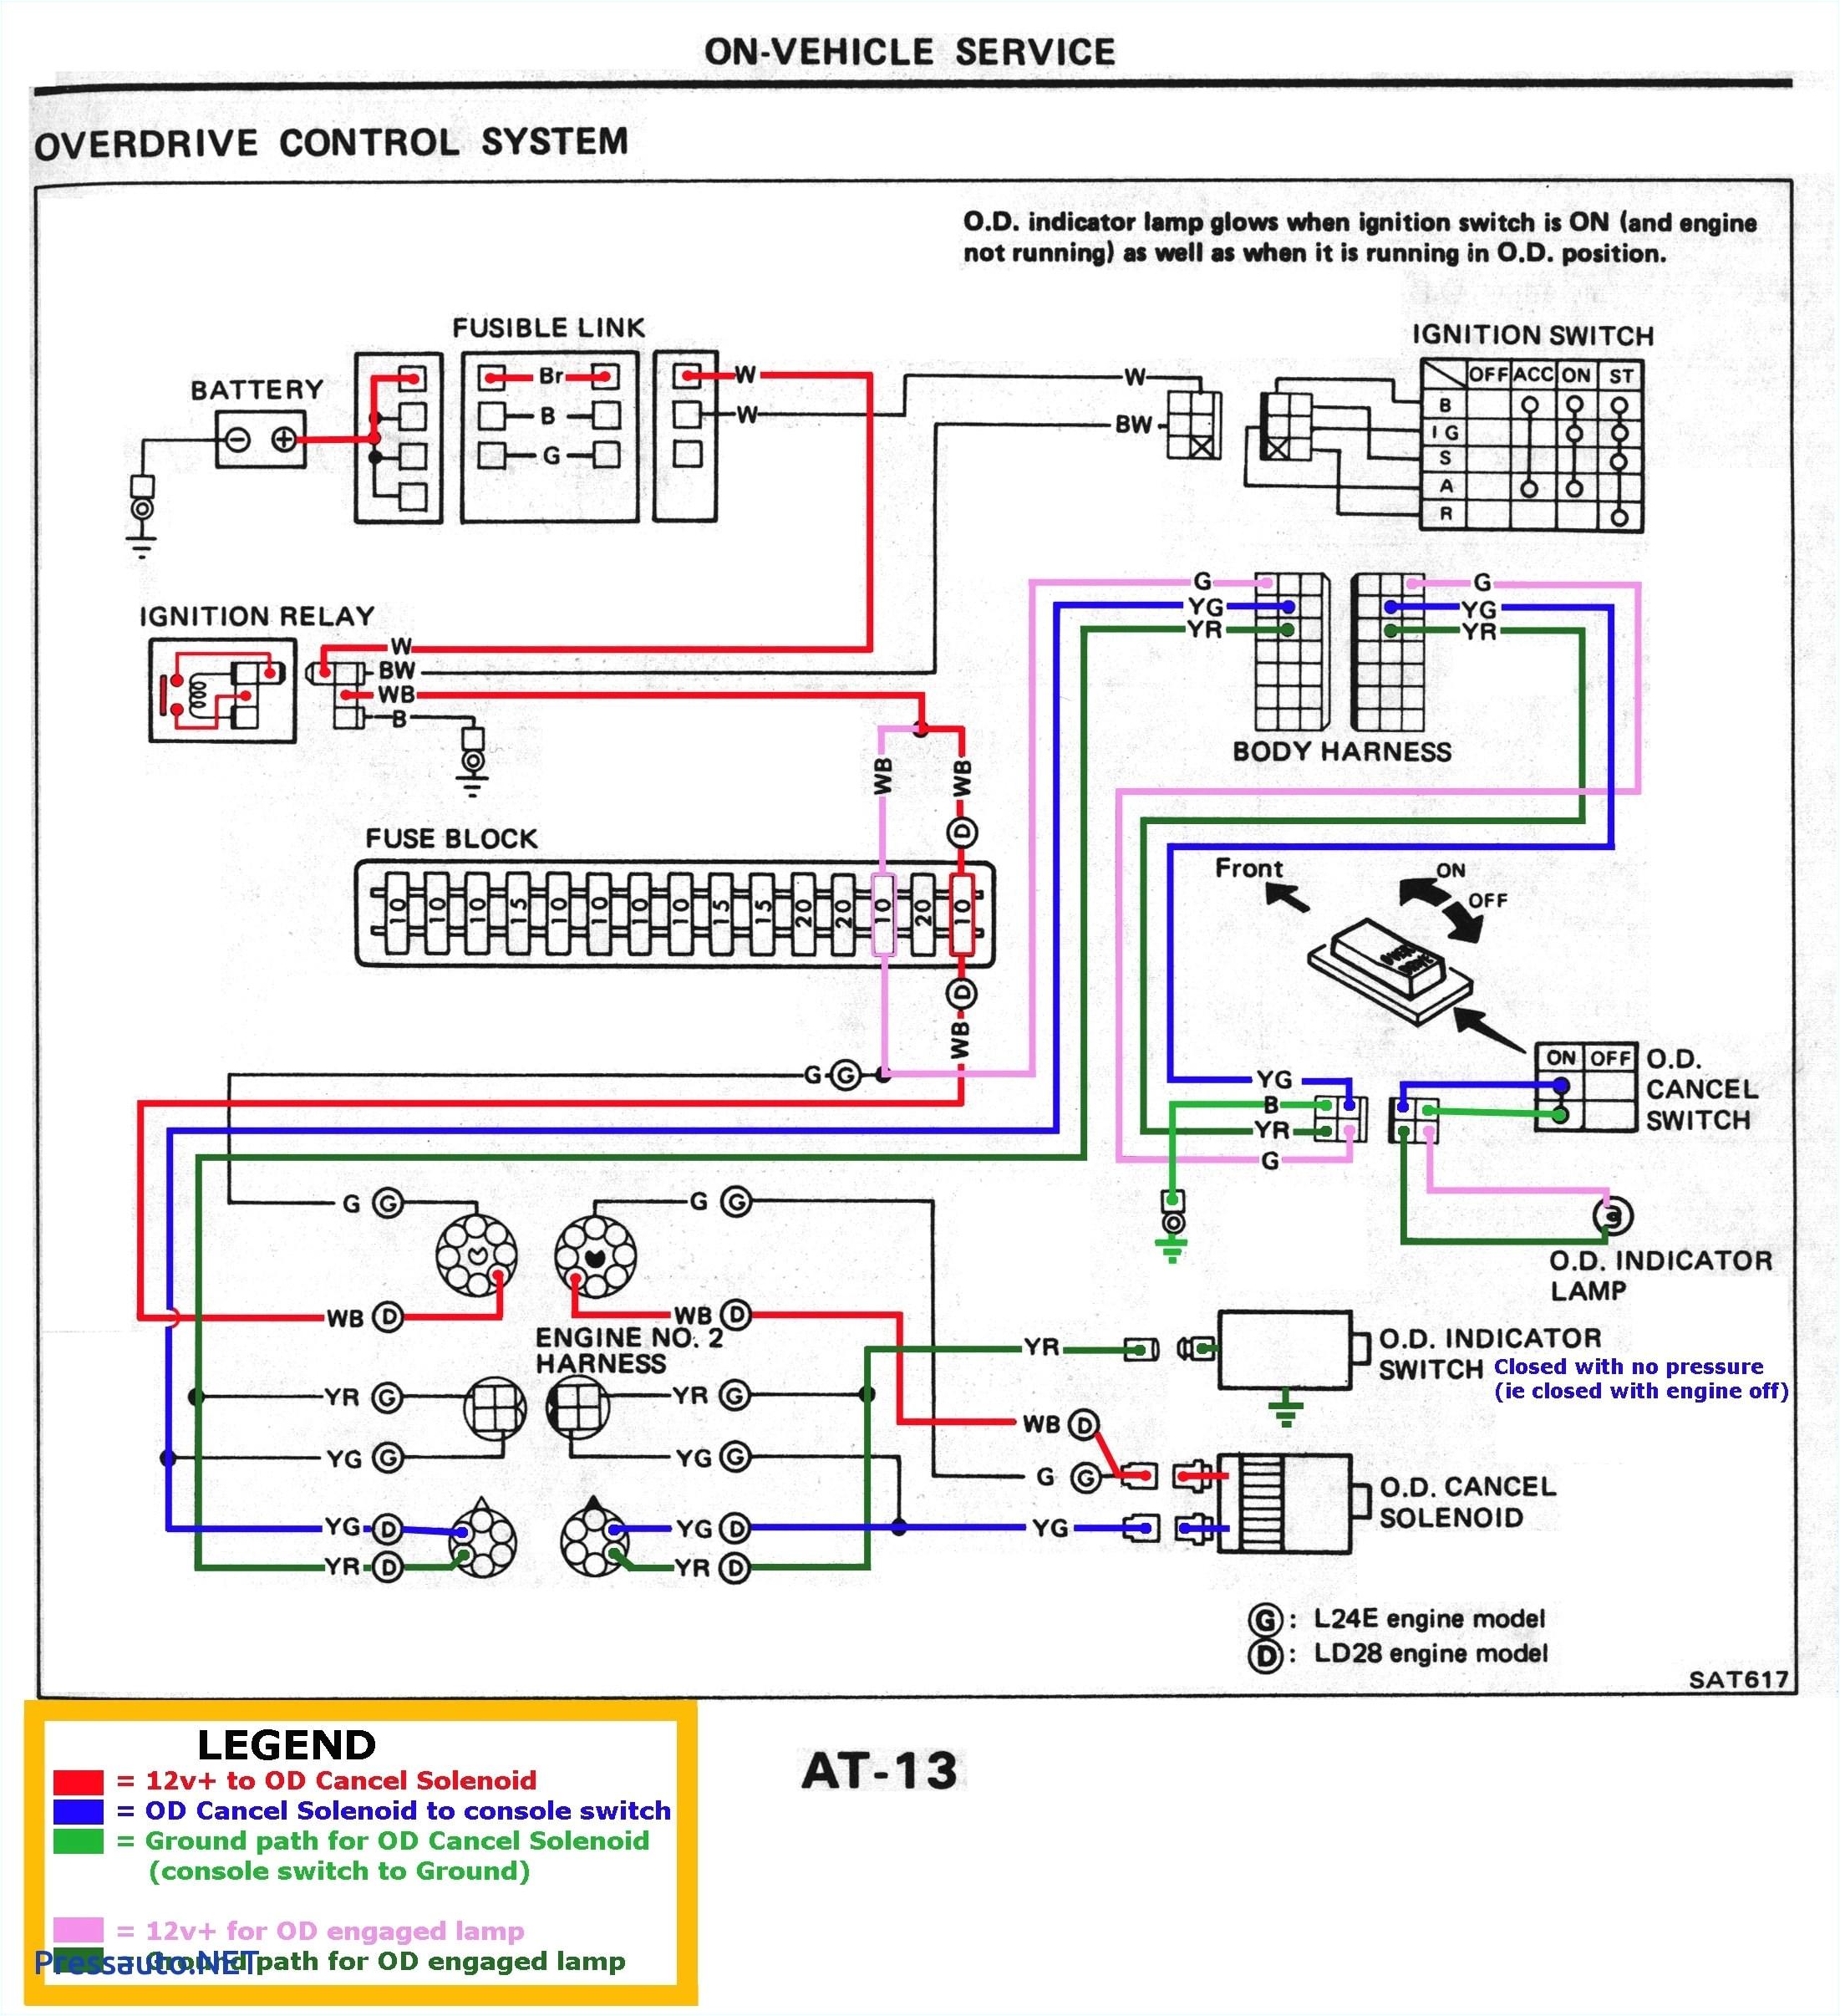 belimo wiring diagrams wiring diagram toolbox belimo actuator wiring guide